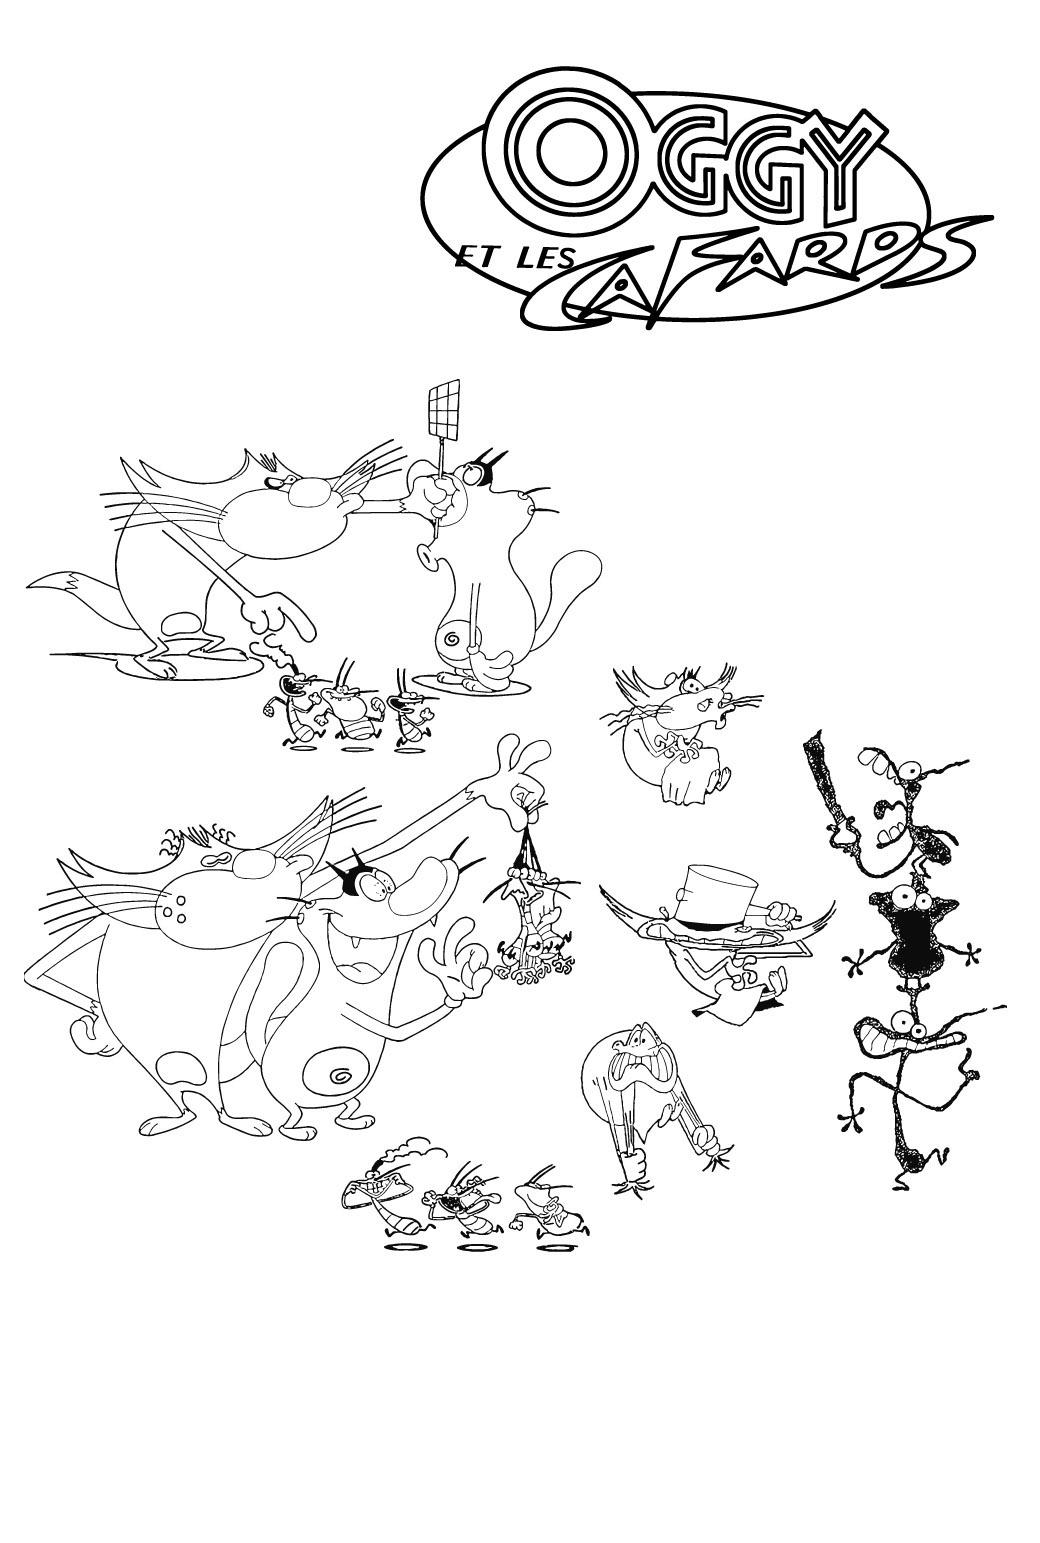 coloriage � dessiner oggy et les cafards a imprimer